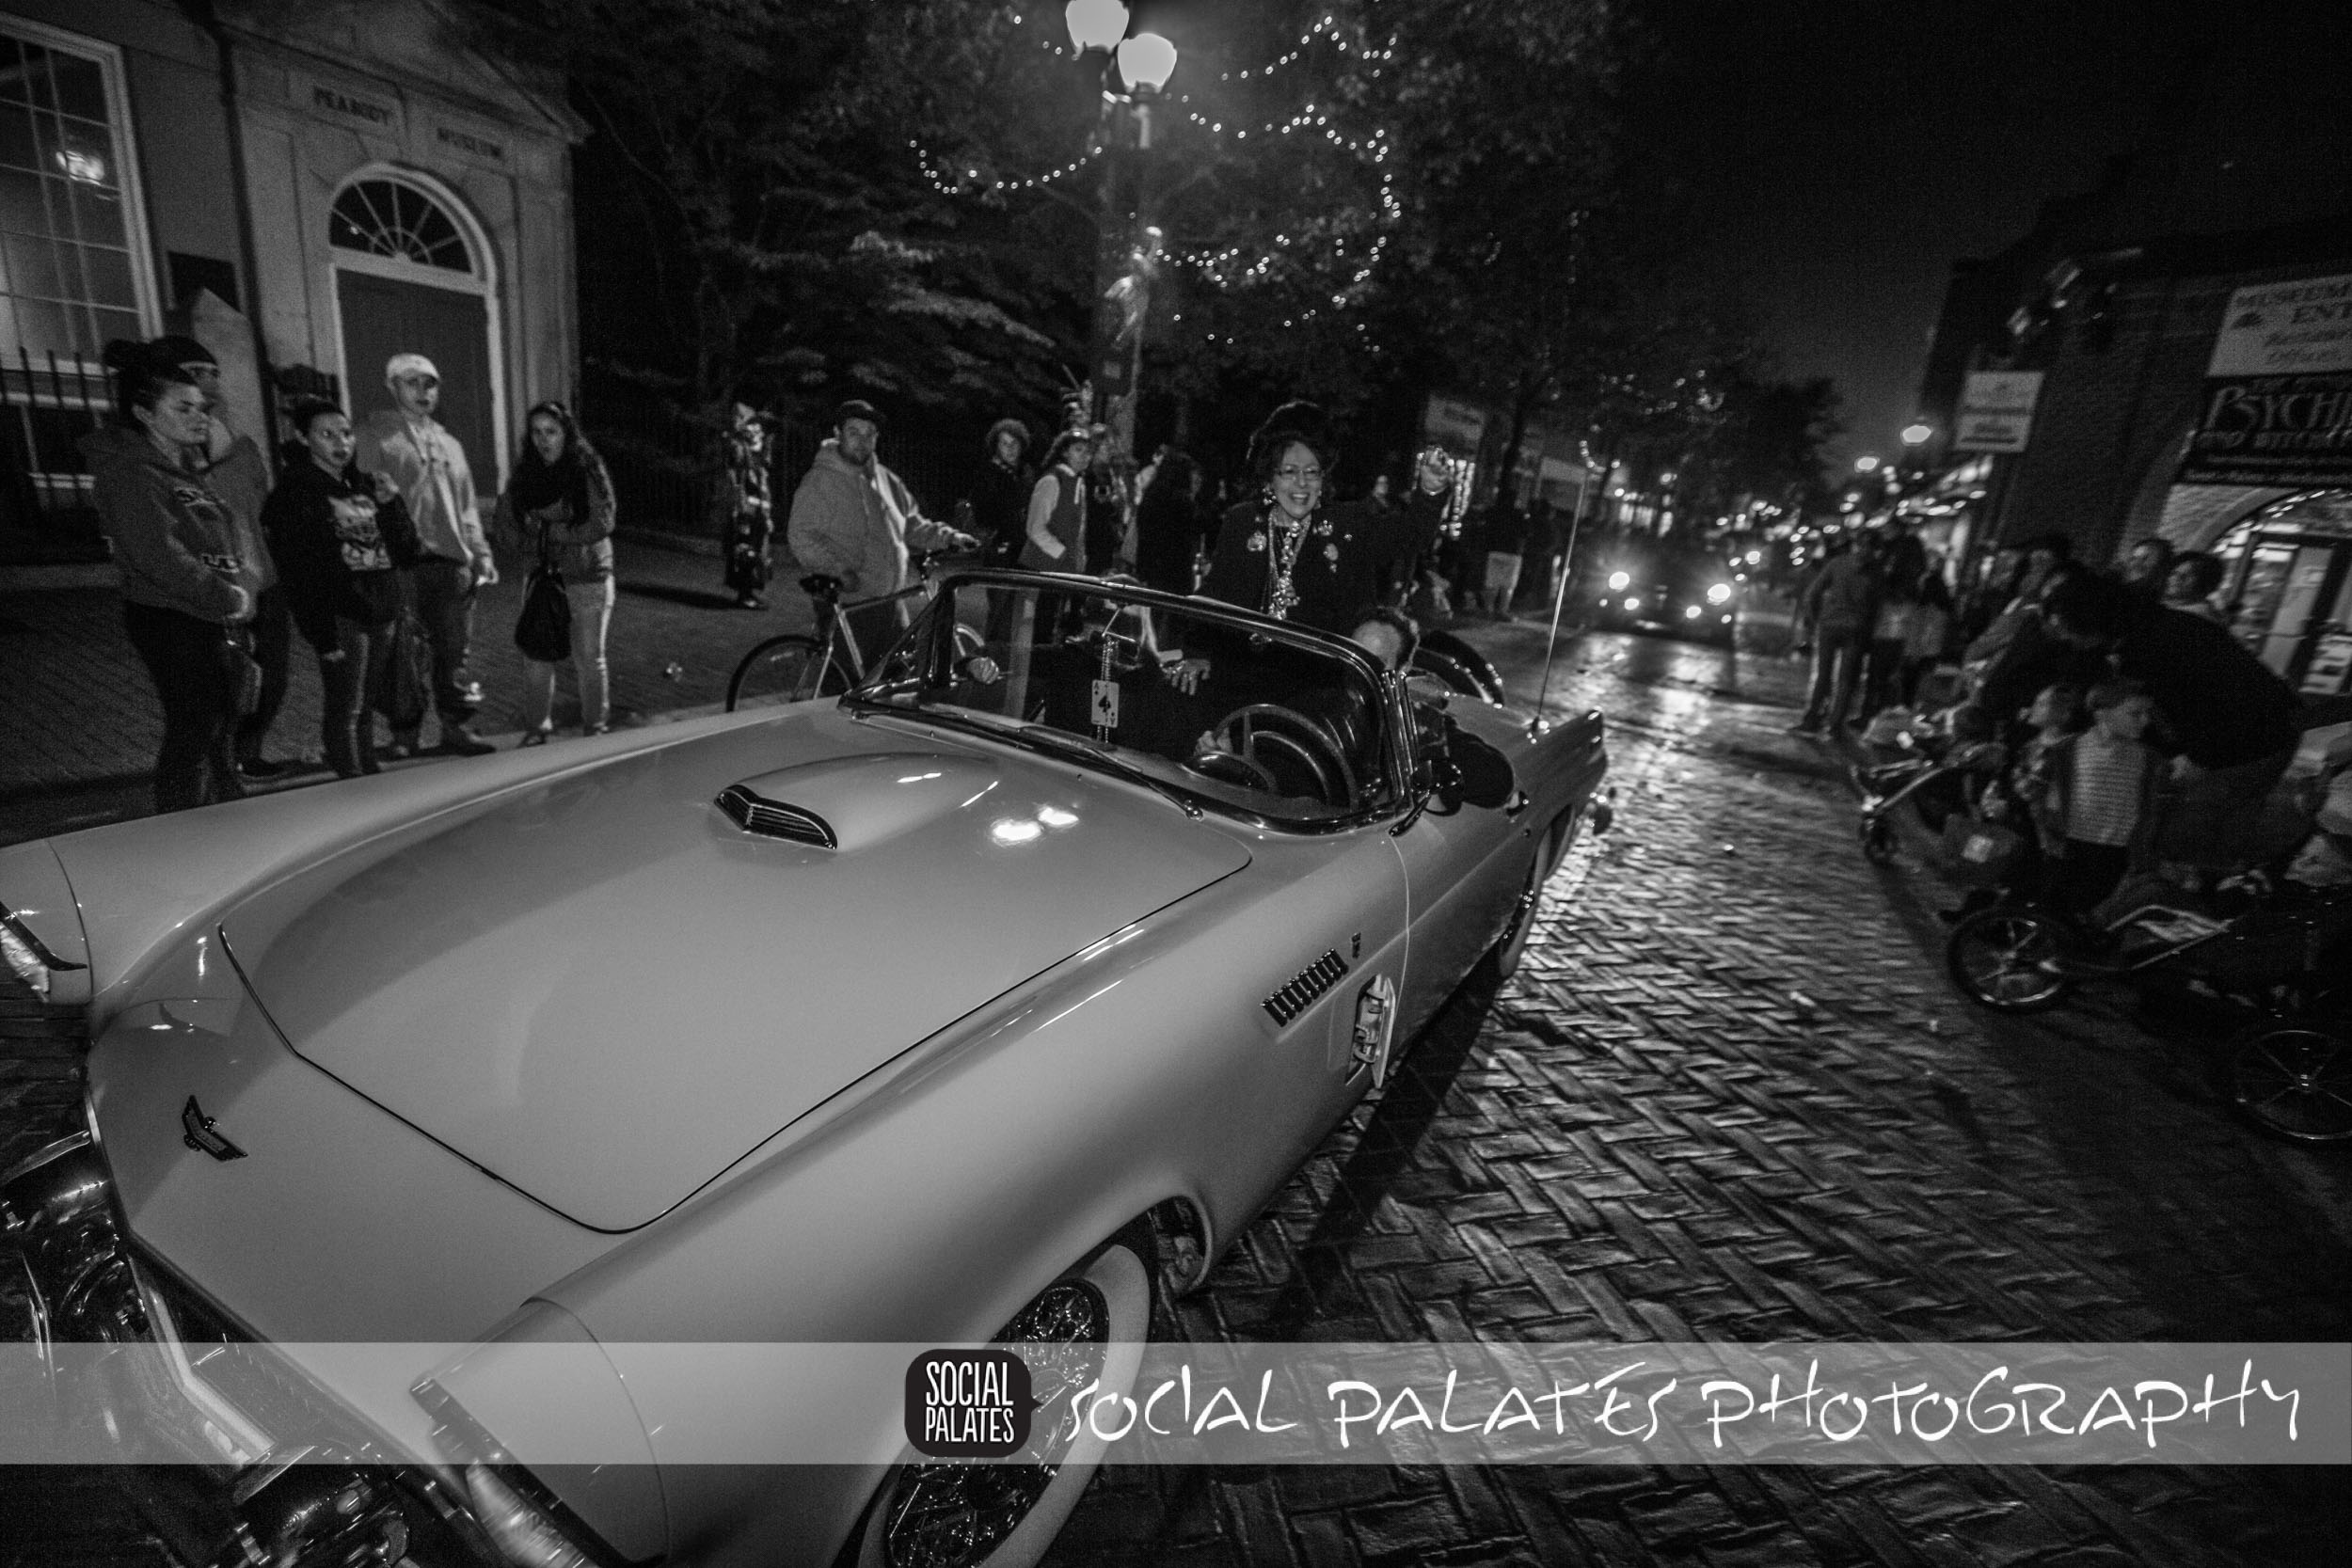 Haunted Happenings Parade 2014 Creative Salem by Social Palates-7603.jpg